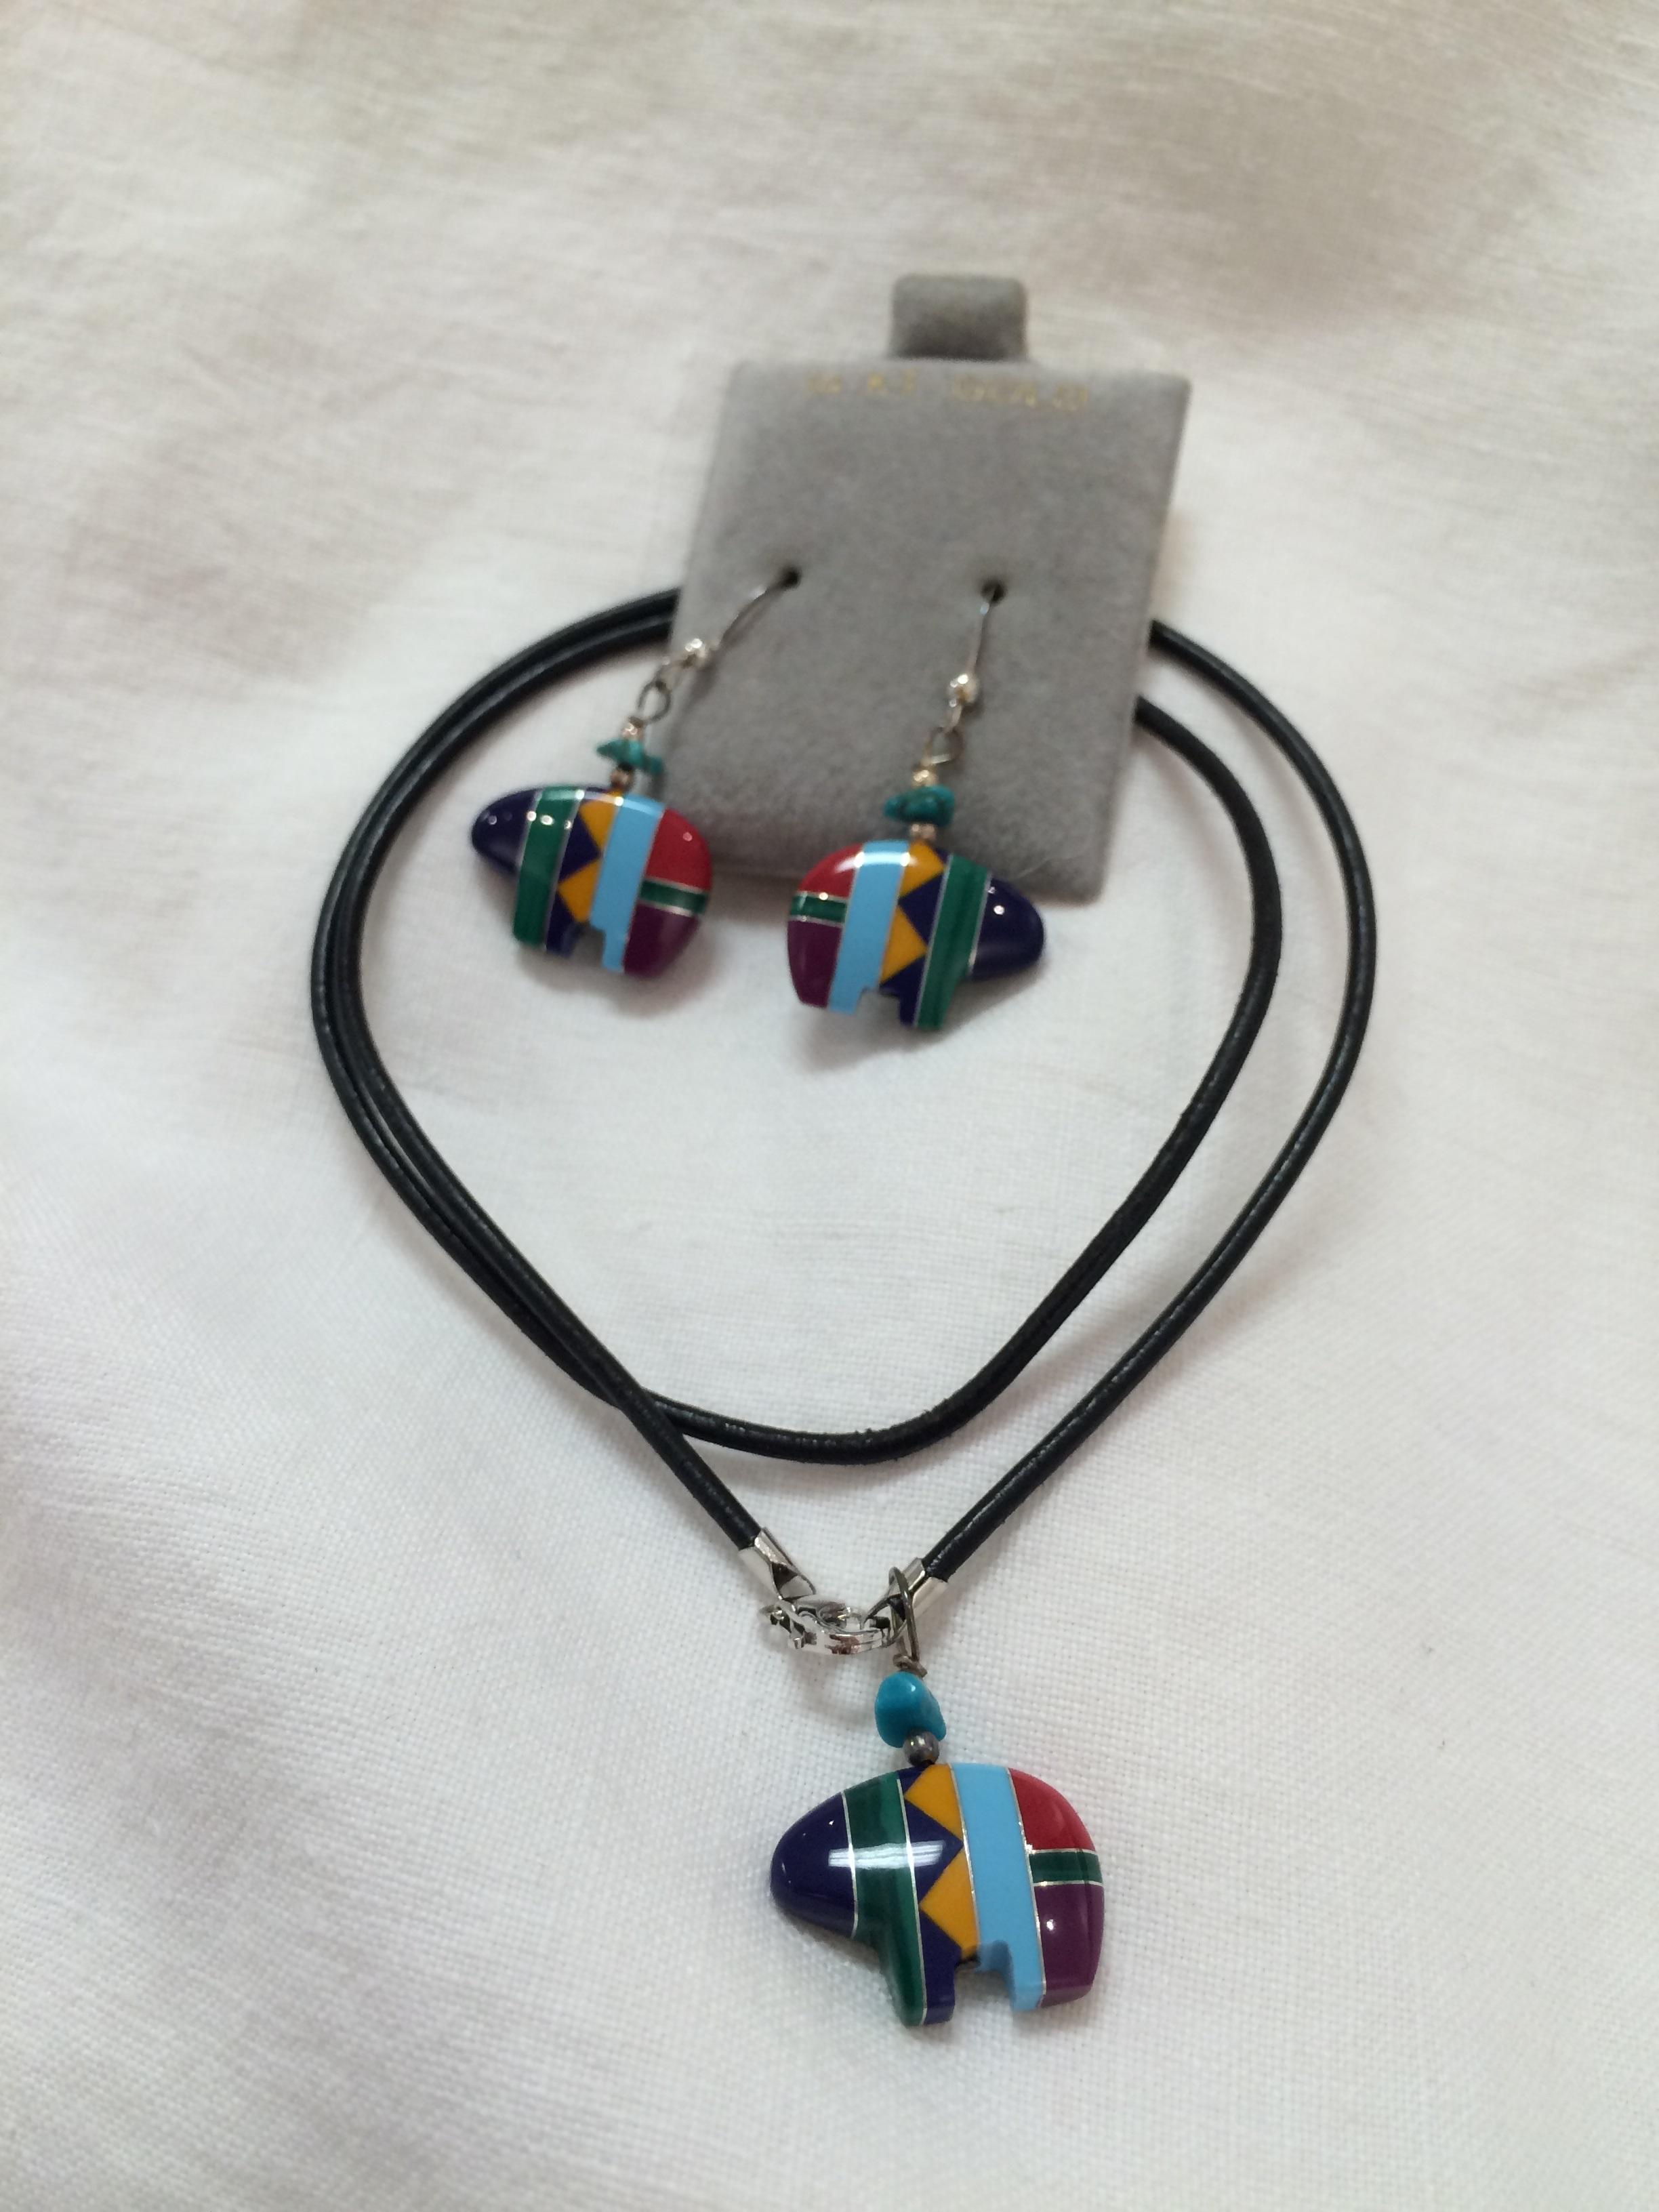 necklace_2.jpg